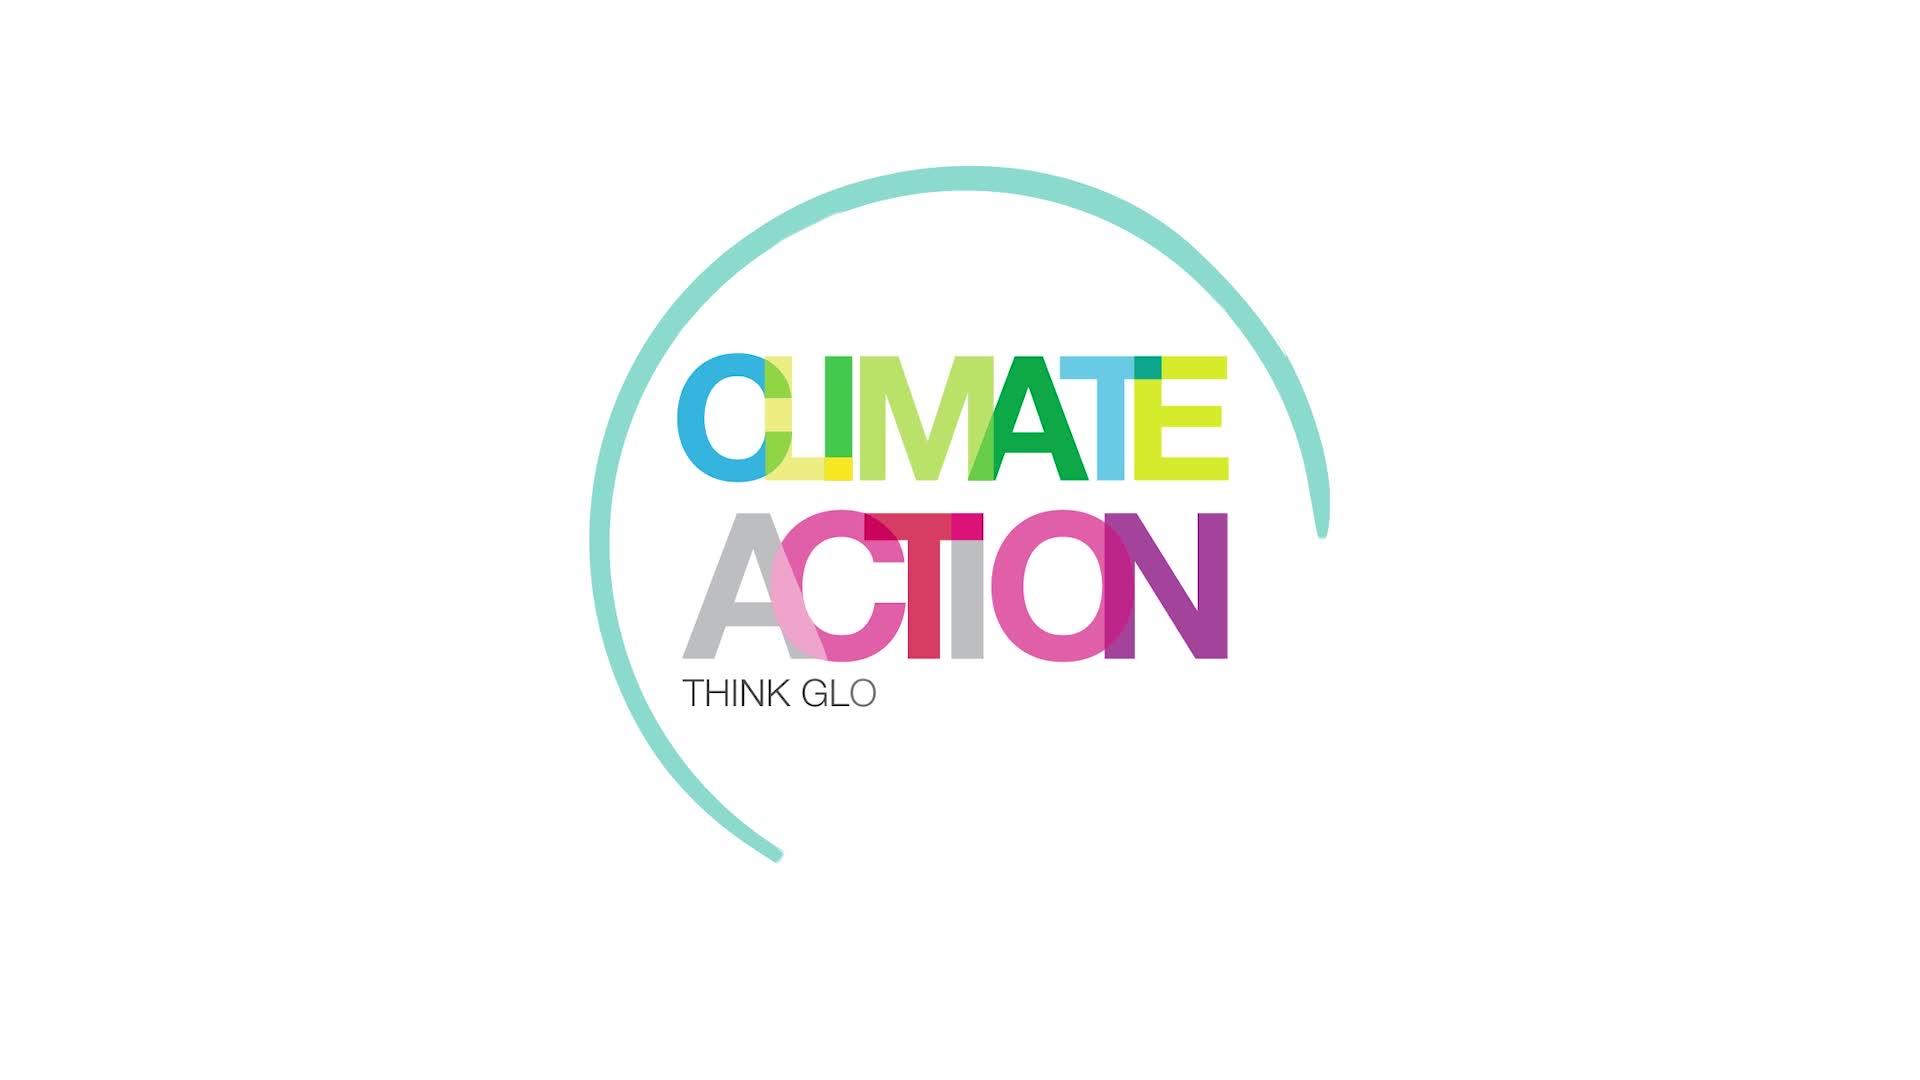 Video: Climate Action, si chiude il primo hackathon ambientale